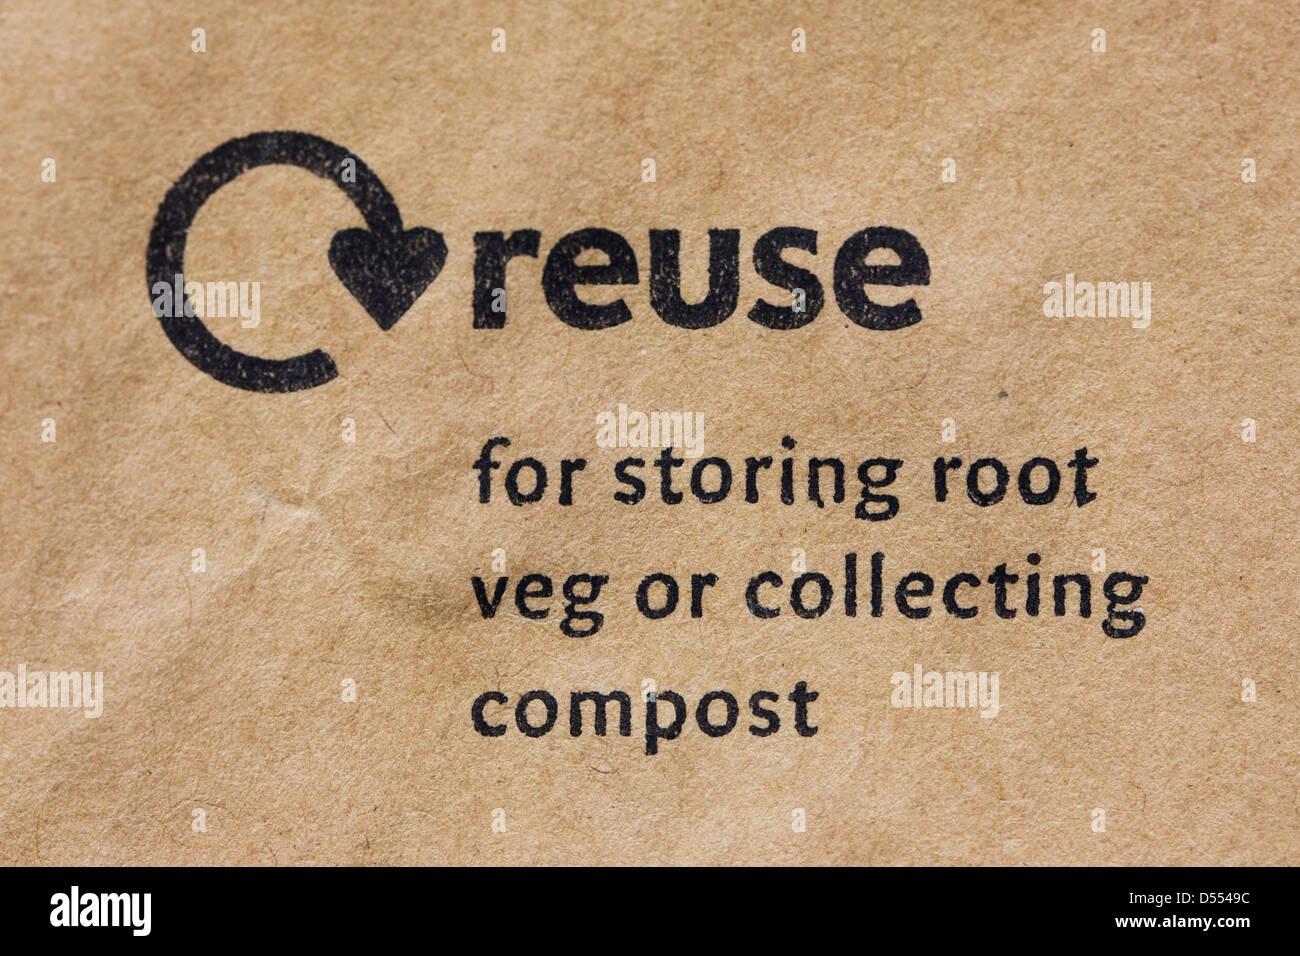 Reuse logo on a brown paper bag. - Stock Image